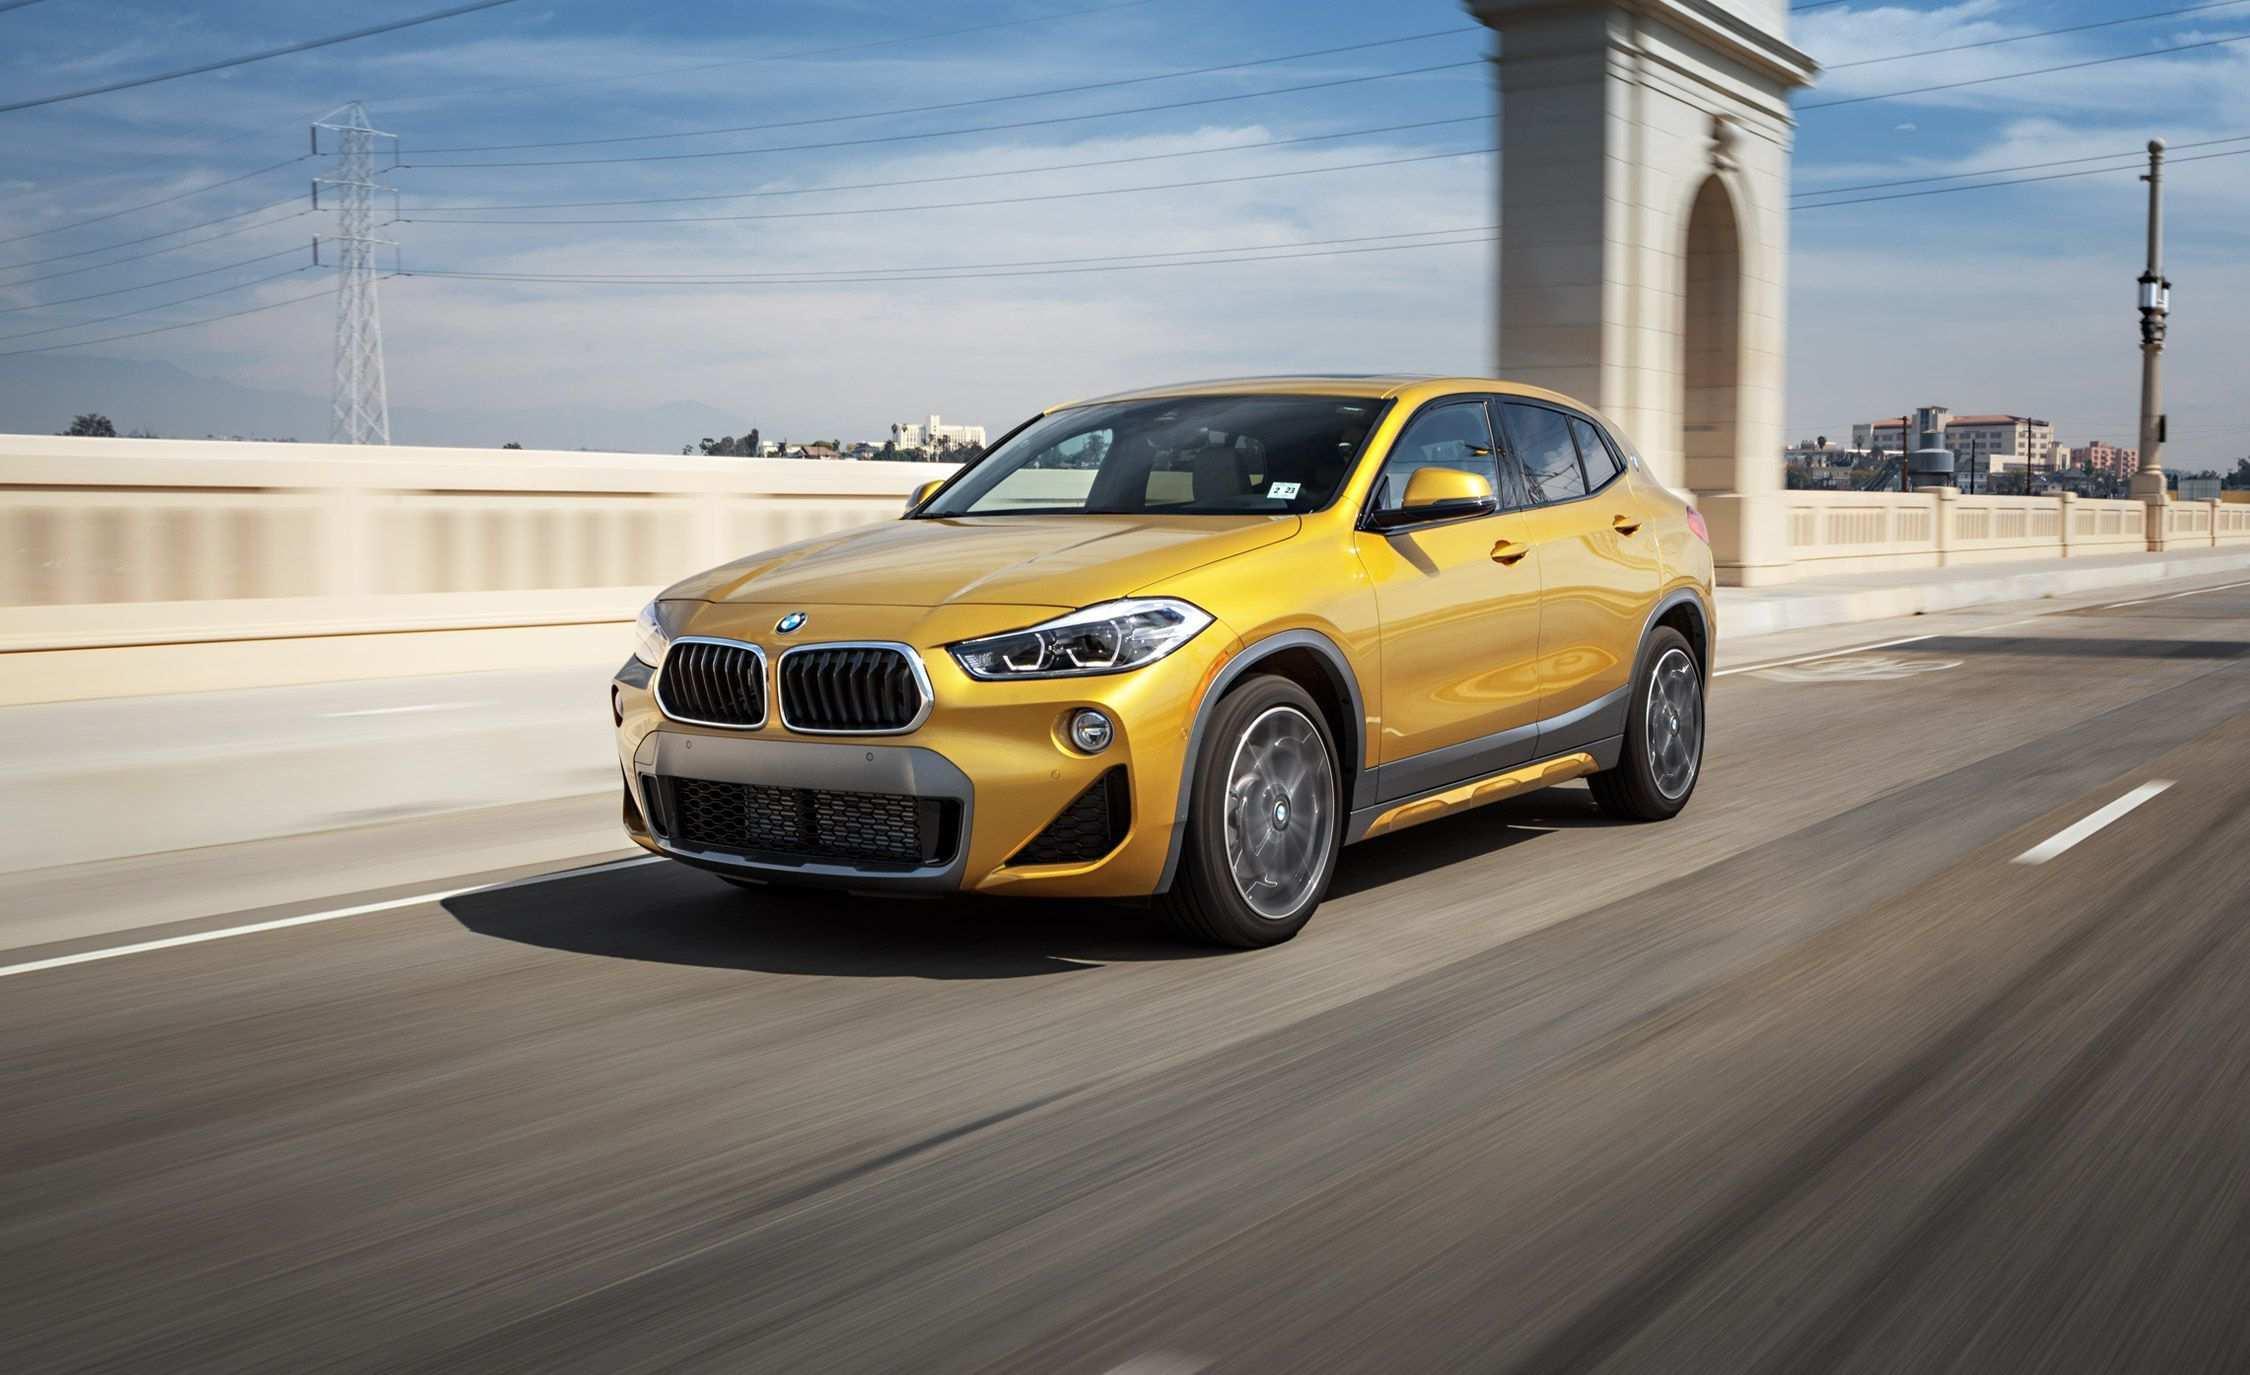 11 All New 2020 BMW Sierra Video Rumors with 2020 BMW Sierra Video